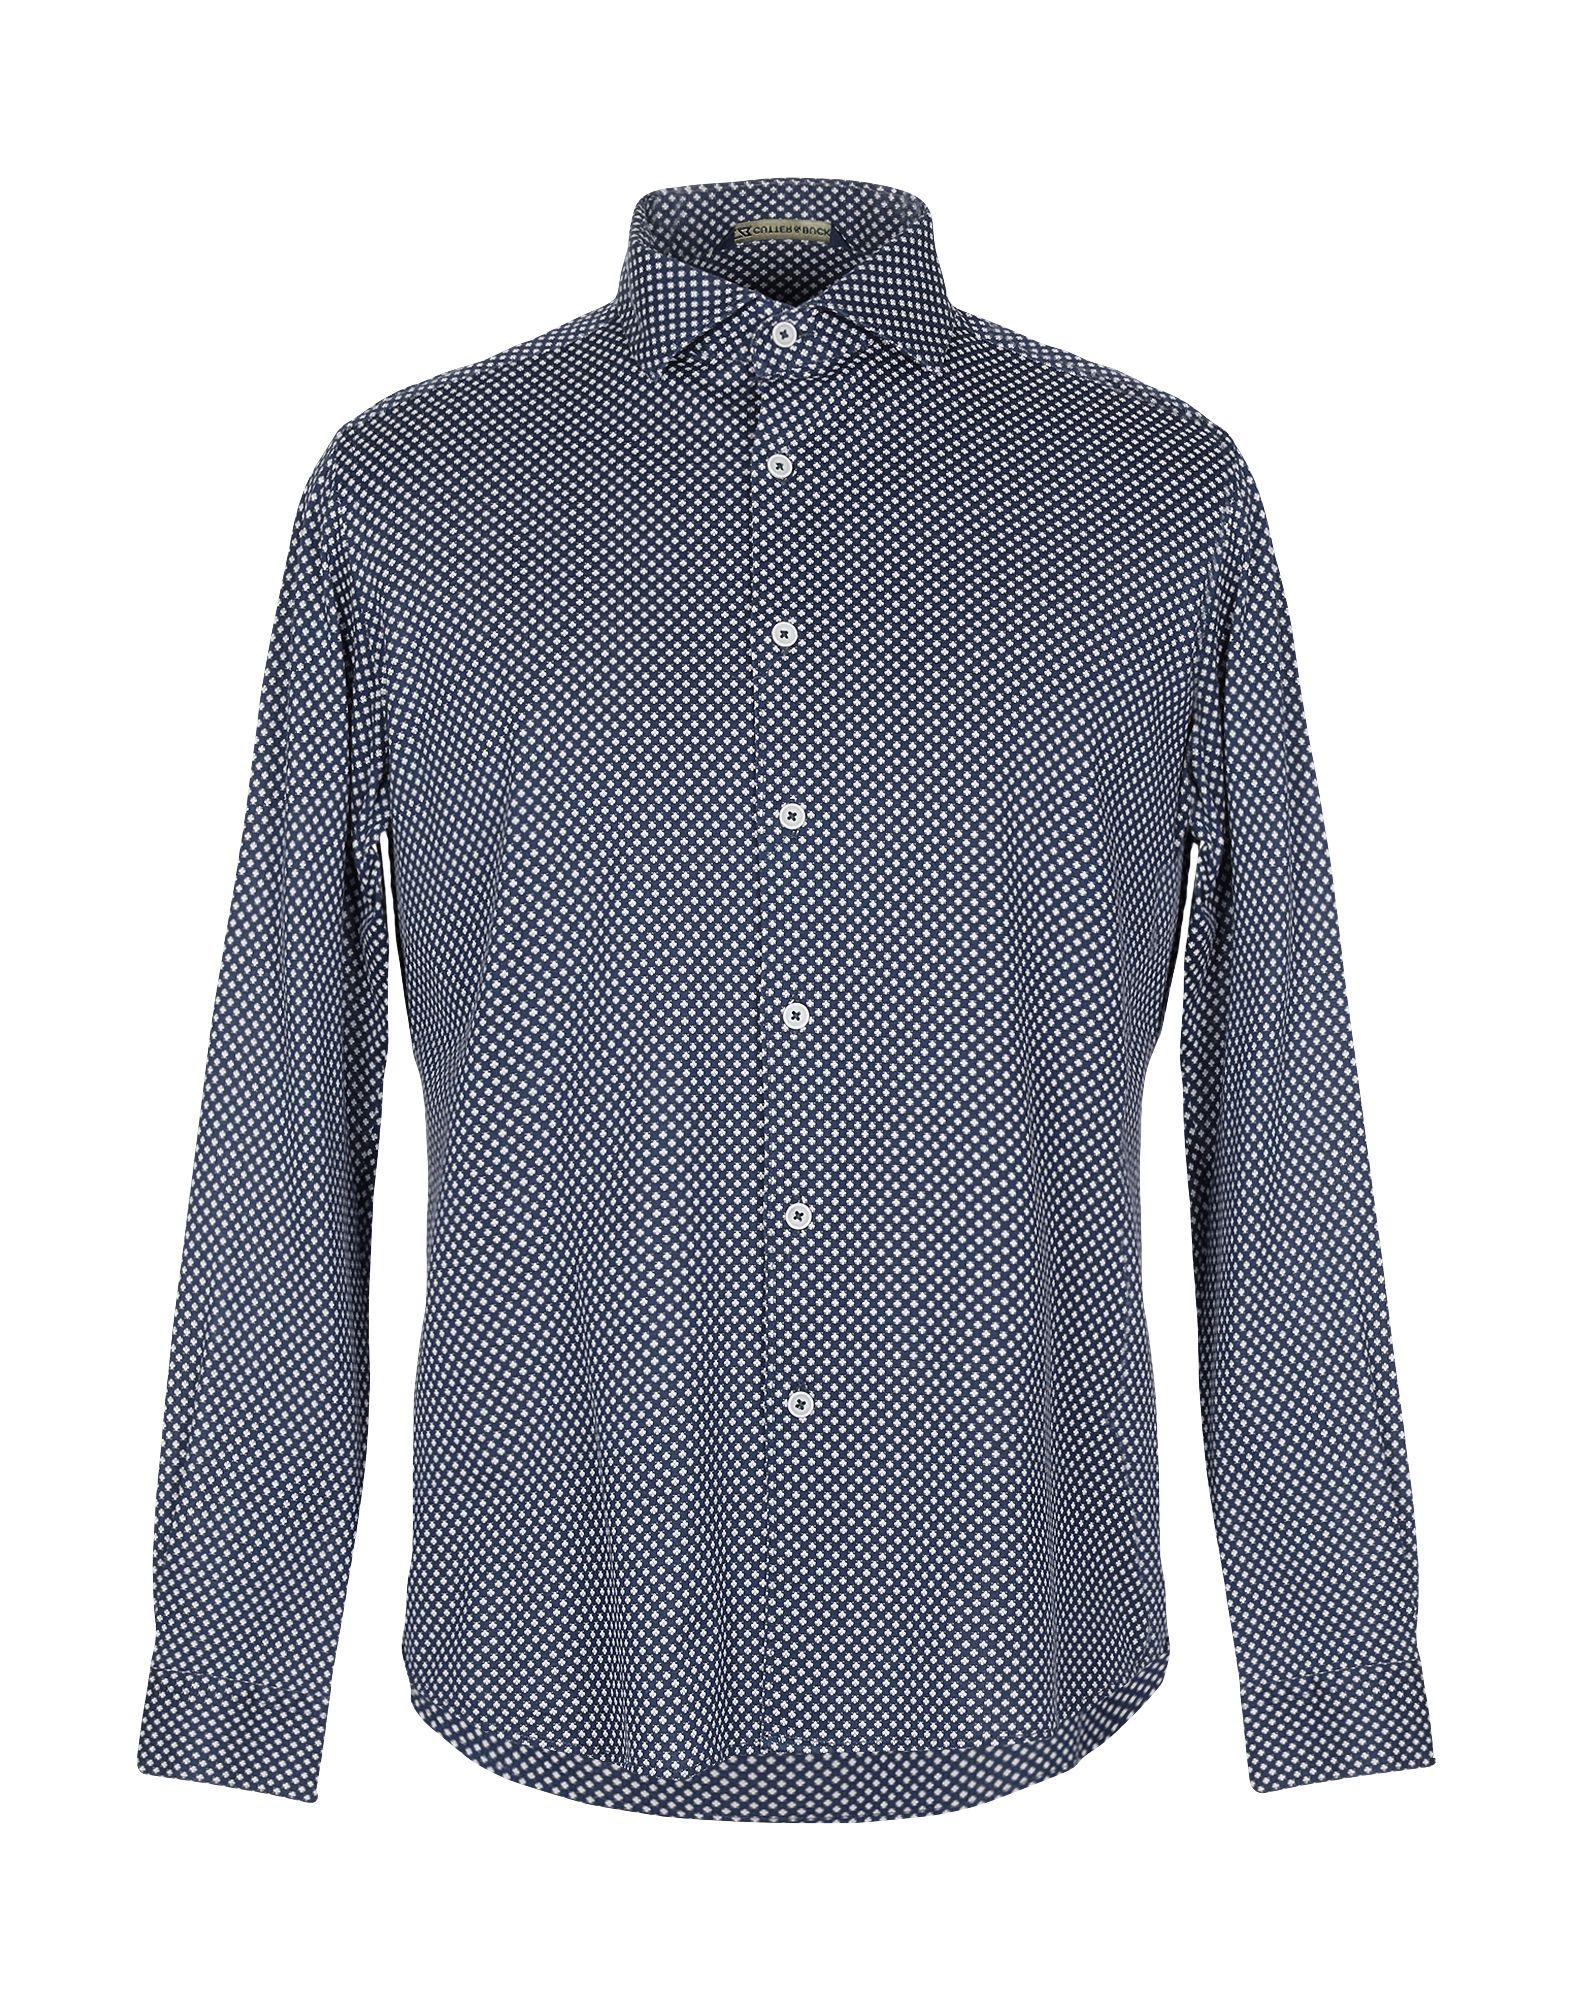 CUTTER & BUCK Shirts. plain weave, no appliqués, floral design, front closure, button closing, long sleeves, buttoned cuffs, classic neckline, no pockets. 100% Cotton